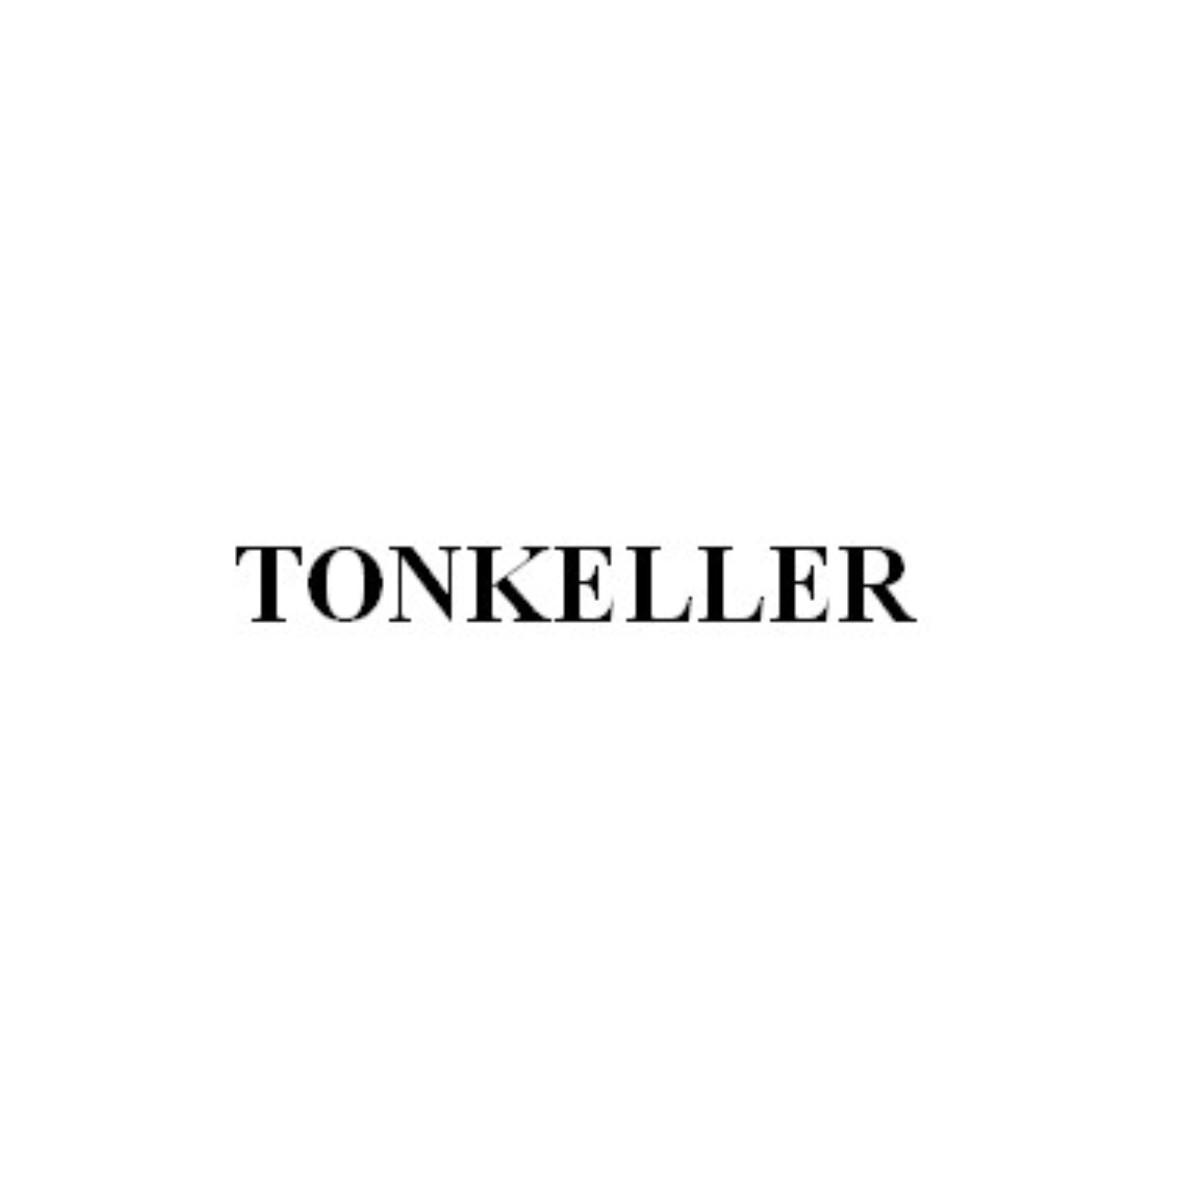 TONKELLER